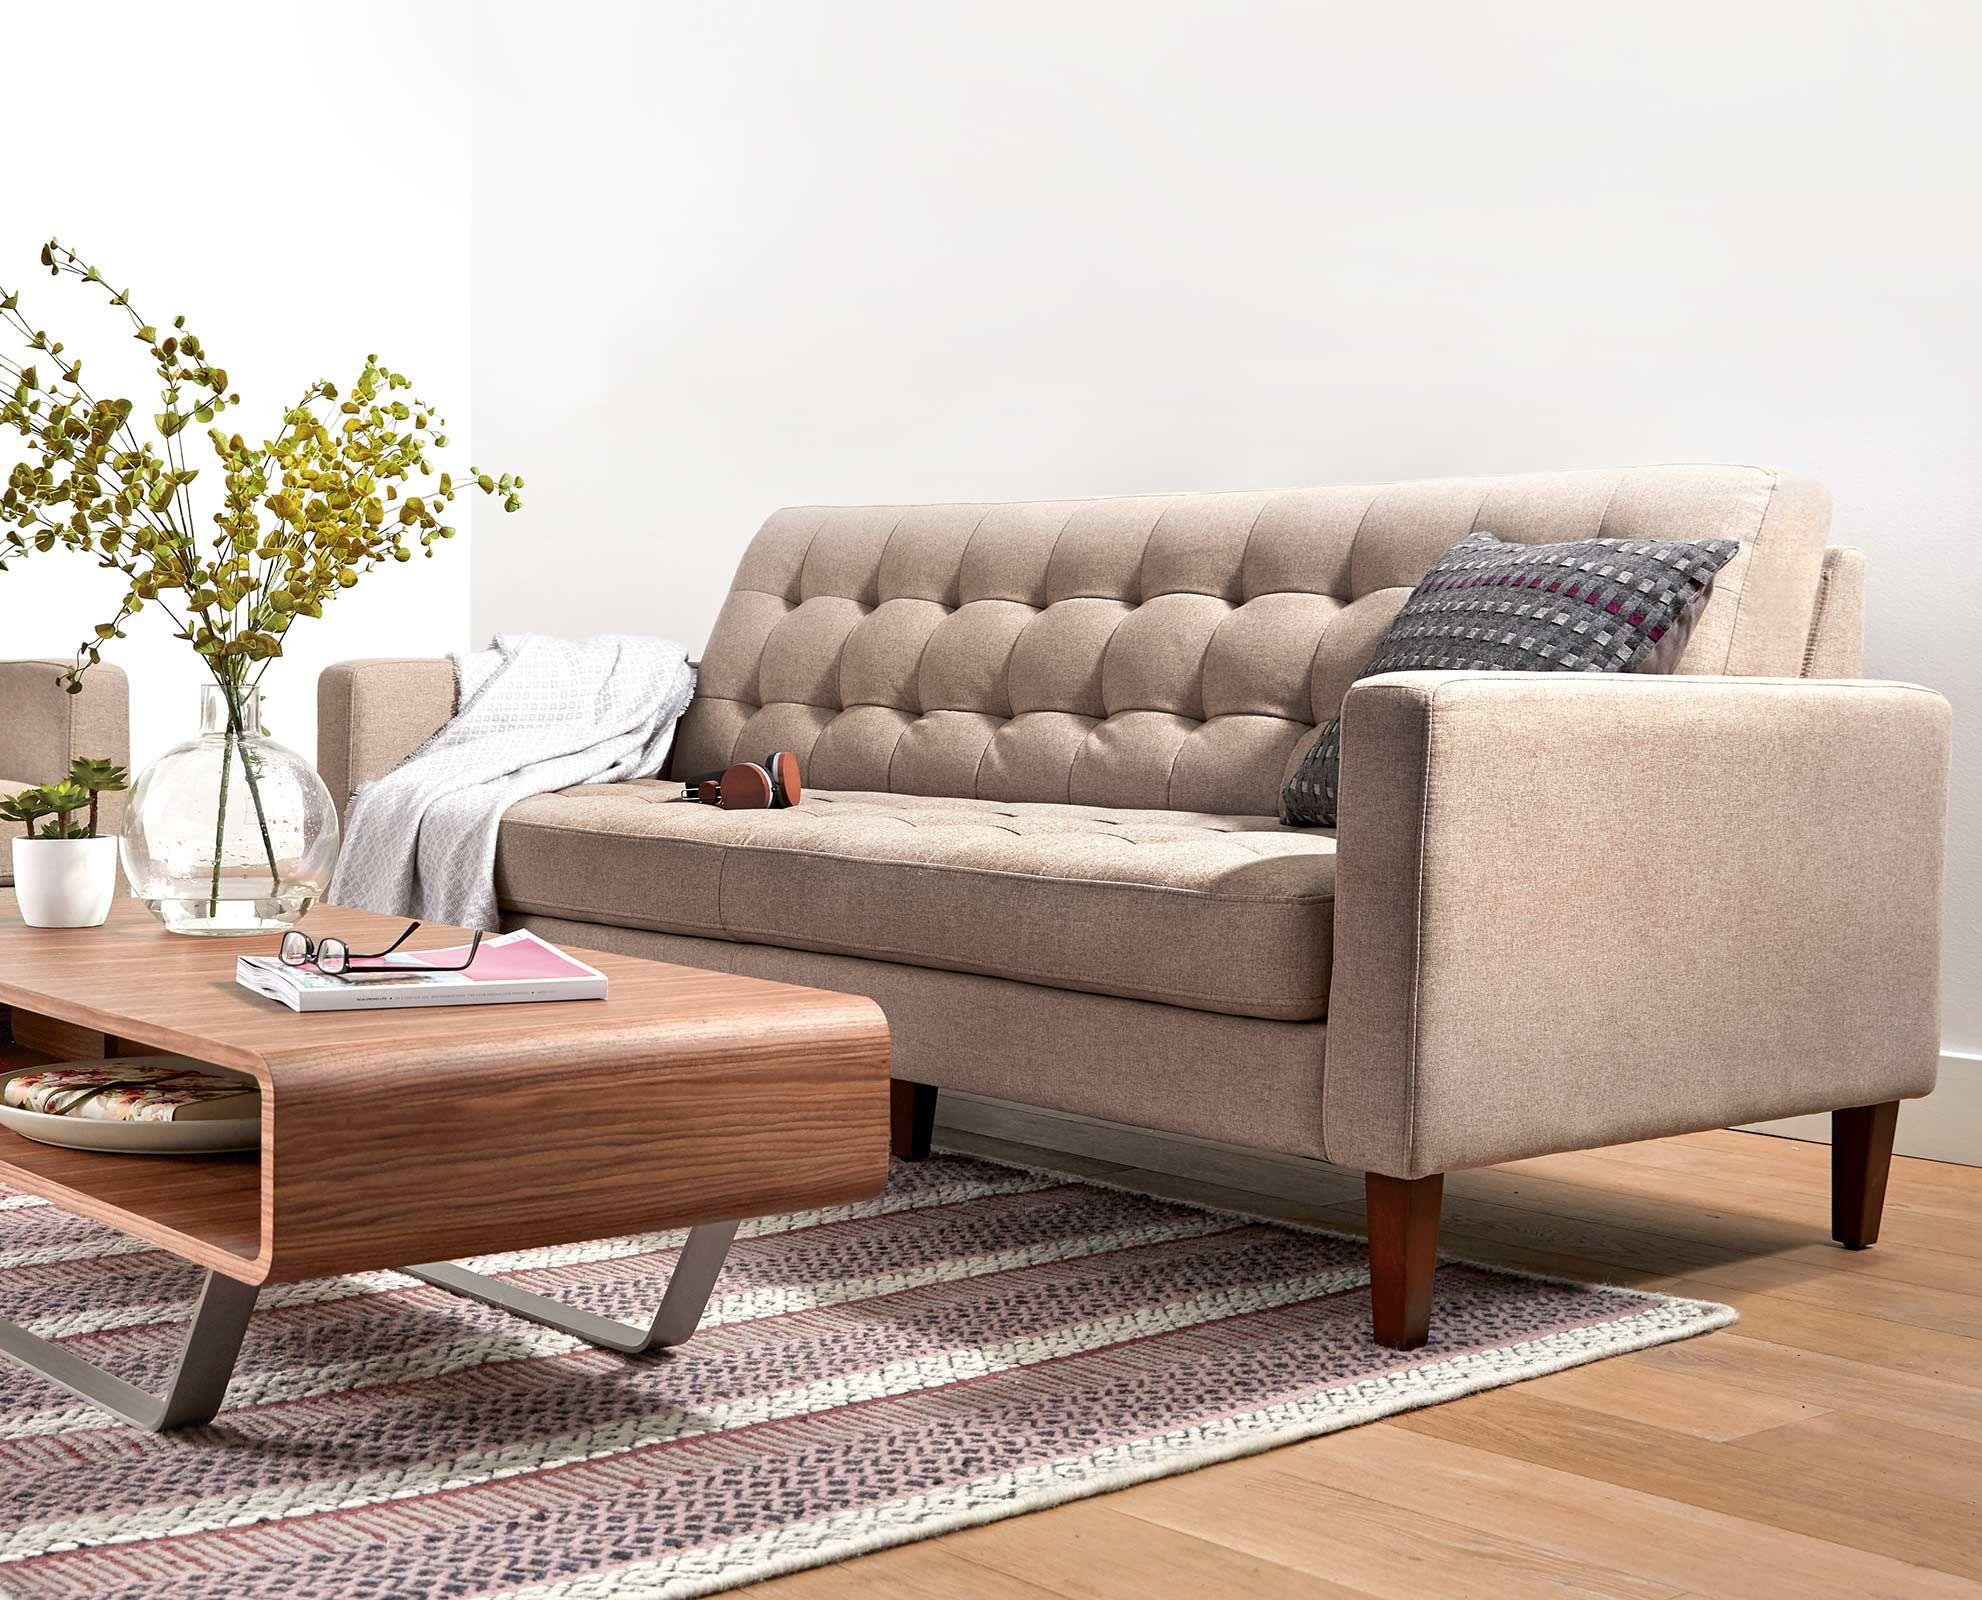 Beautiful Laura Sofa From Dania Furniture